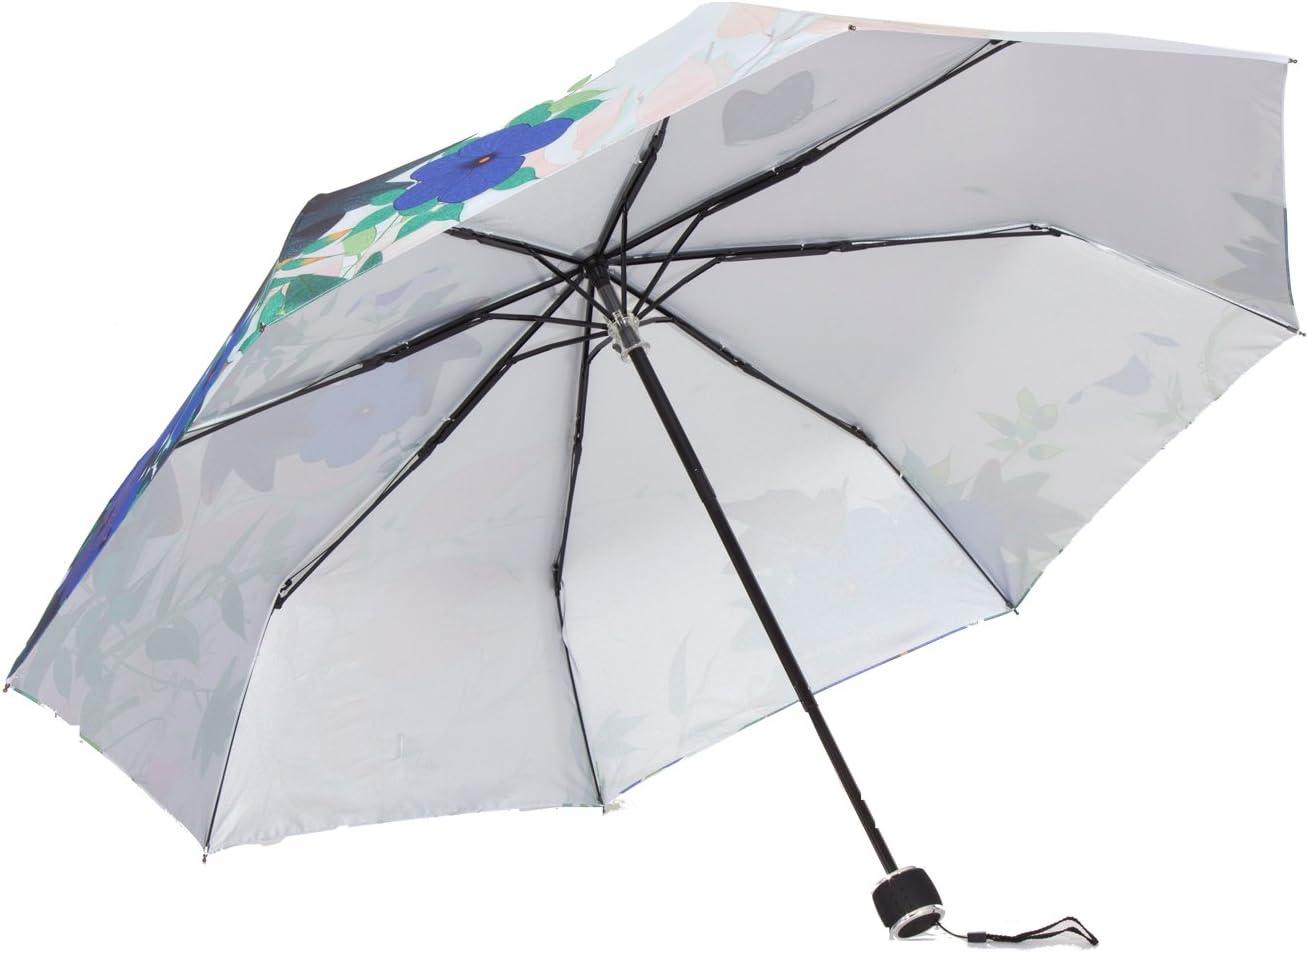 molshine Windproof Travel Umbrella-Compact Folding Lightweight Portable Parasol Umbrella for Women,Gift Choice butterfly